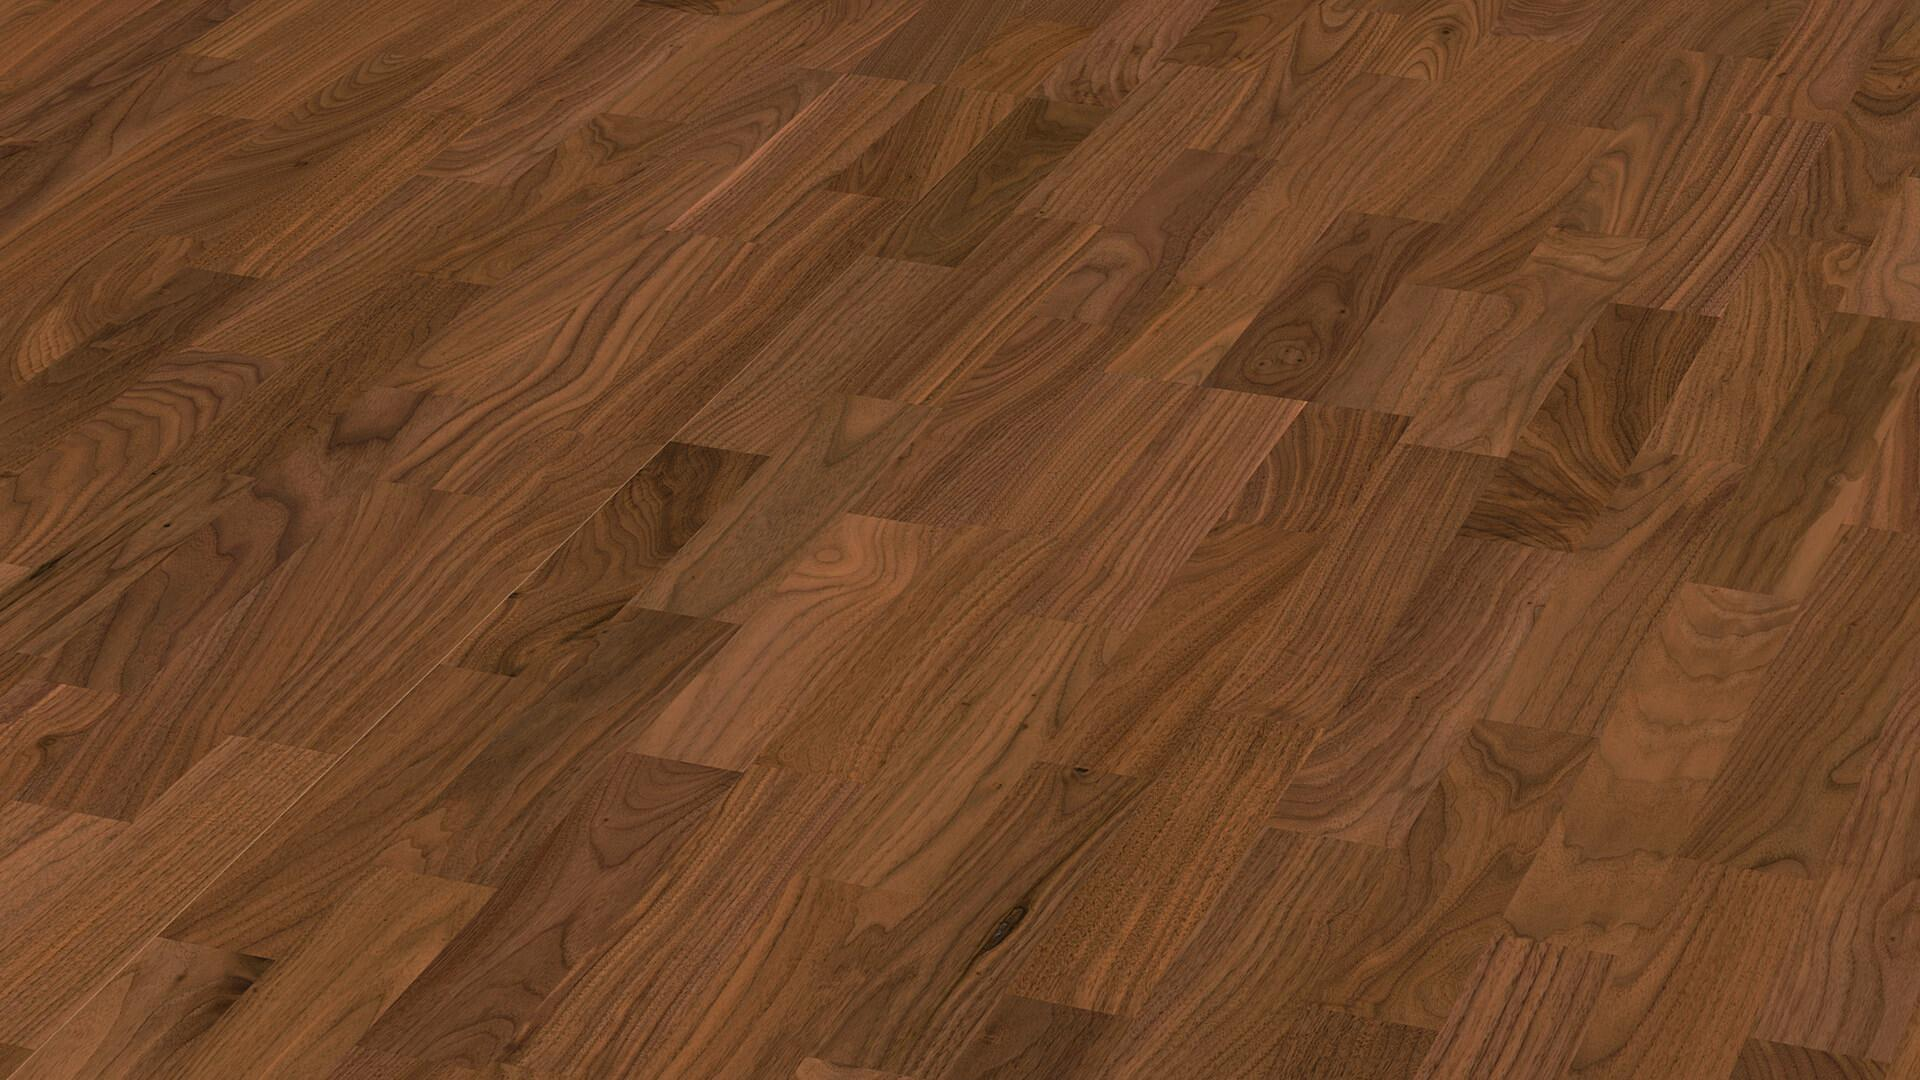 Parquet flooring MeisterParquet. longlife PC 200 American walnut harmonious 960